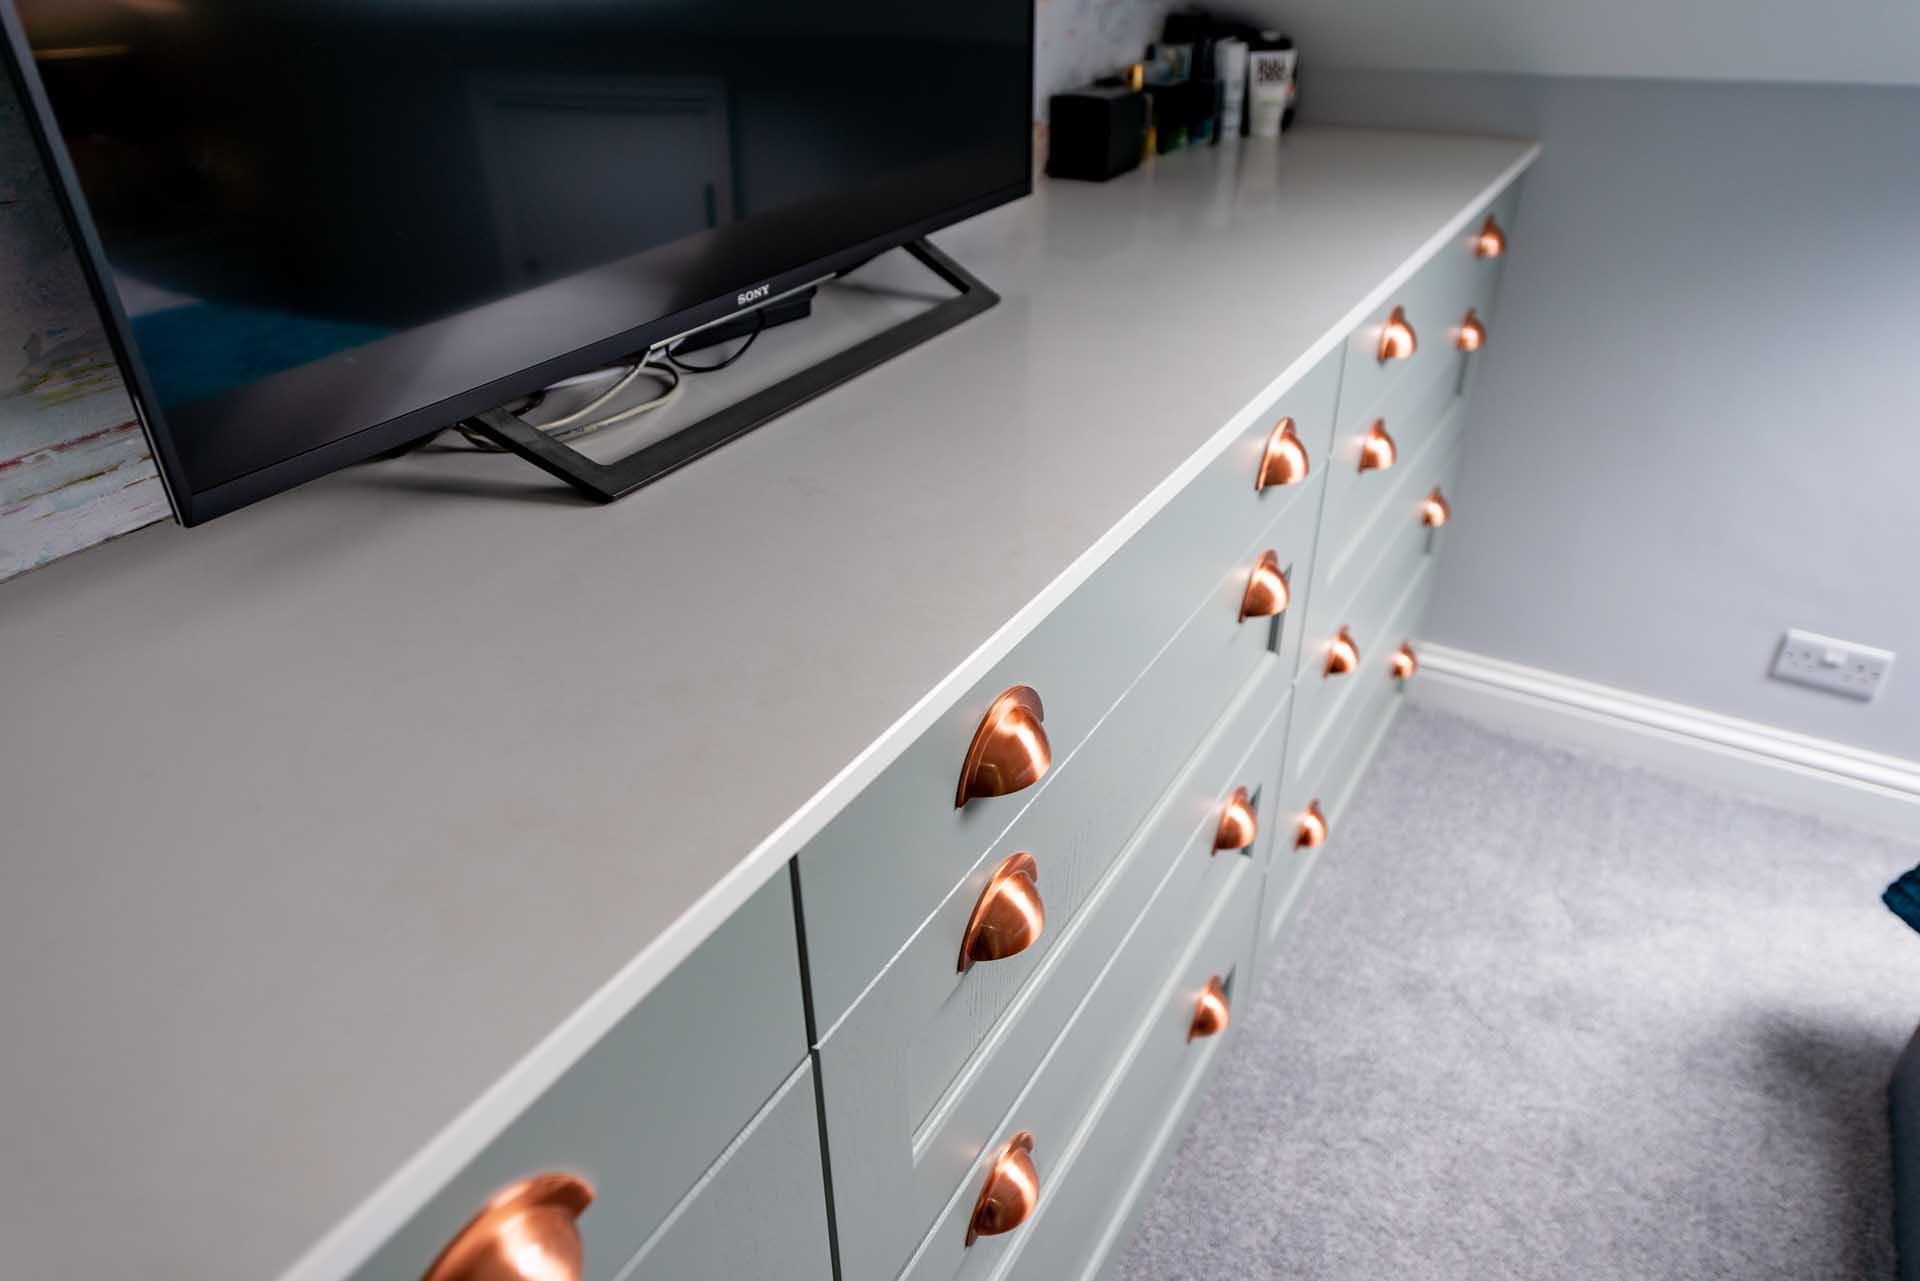 Novella-Designs-kitchen-fitters-151122a